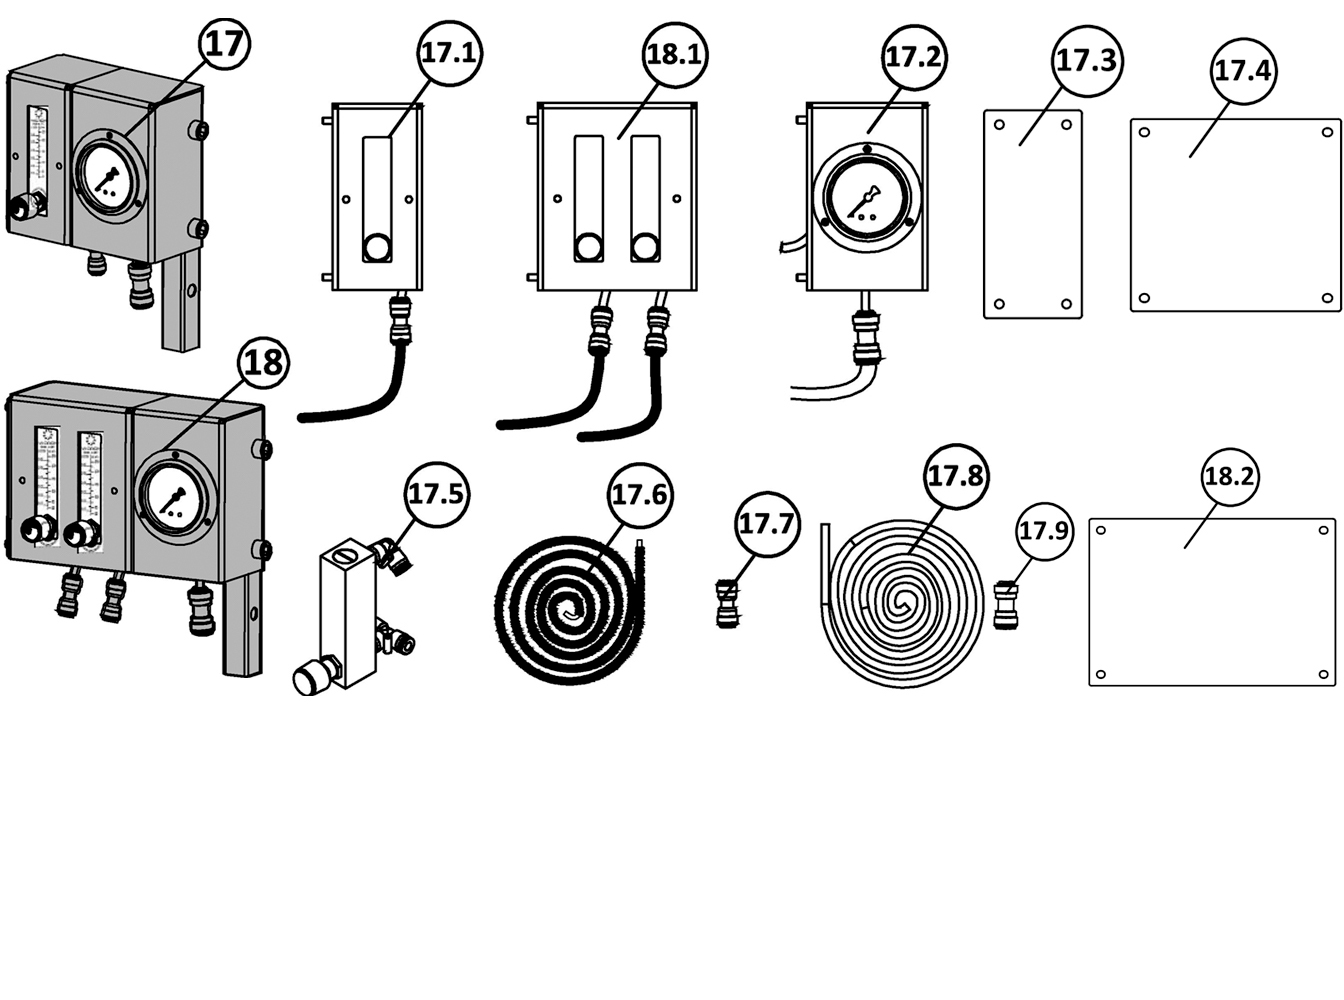 rep-panel-de-control - image #1